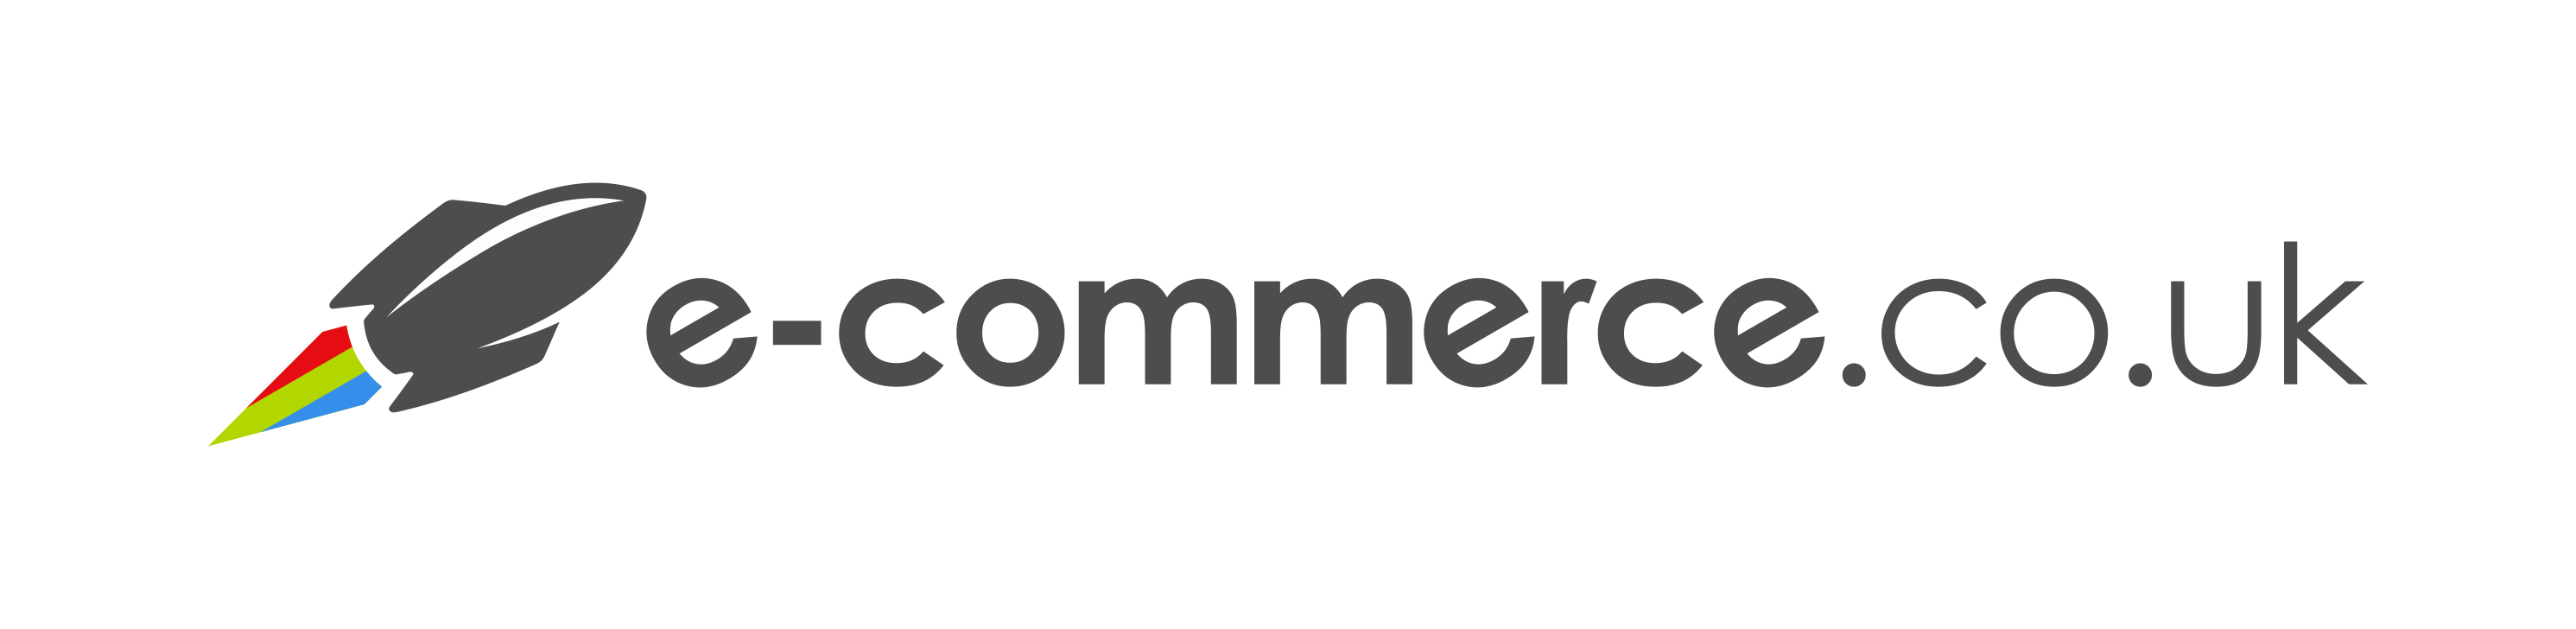 e-commerce.co.uk